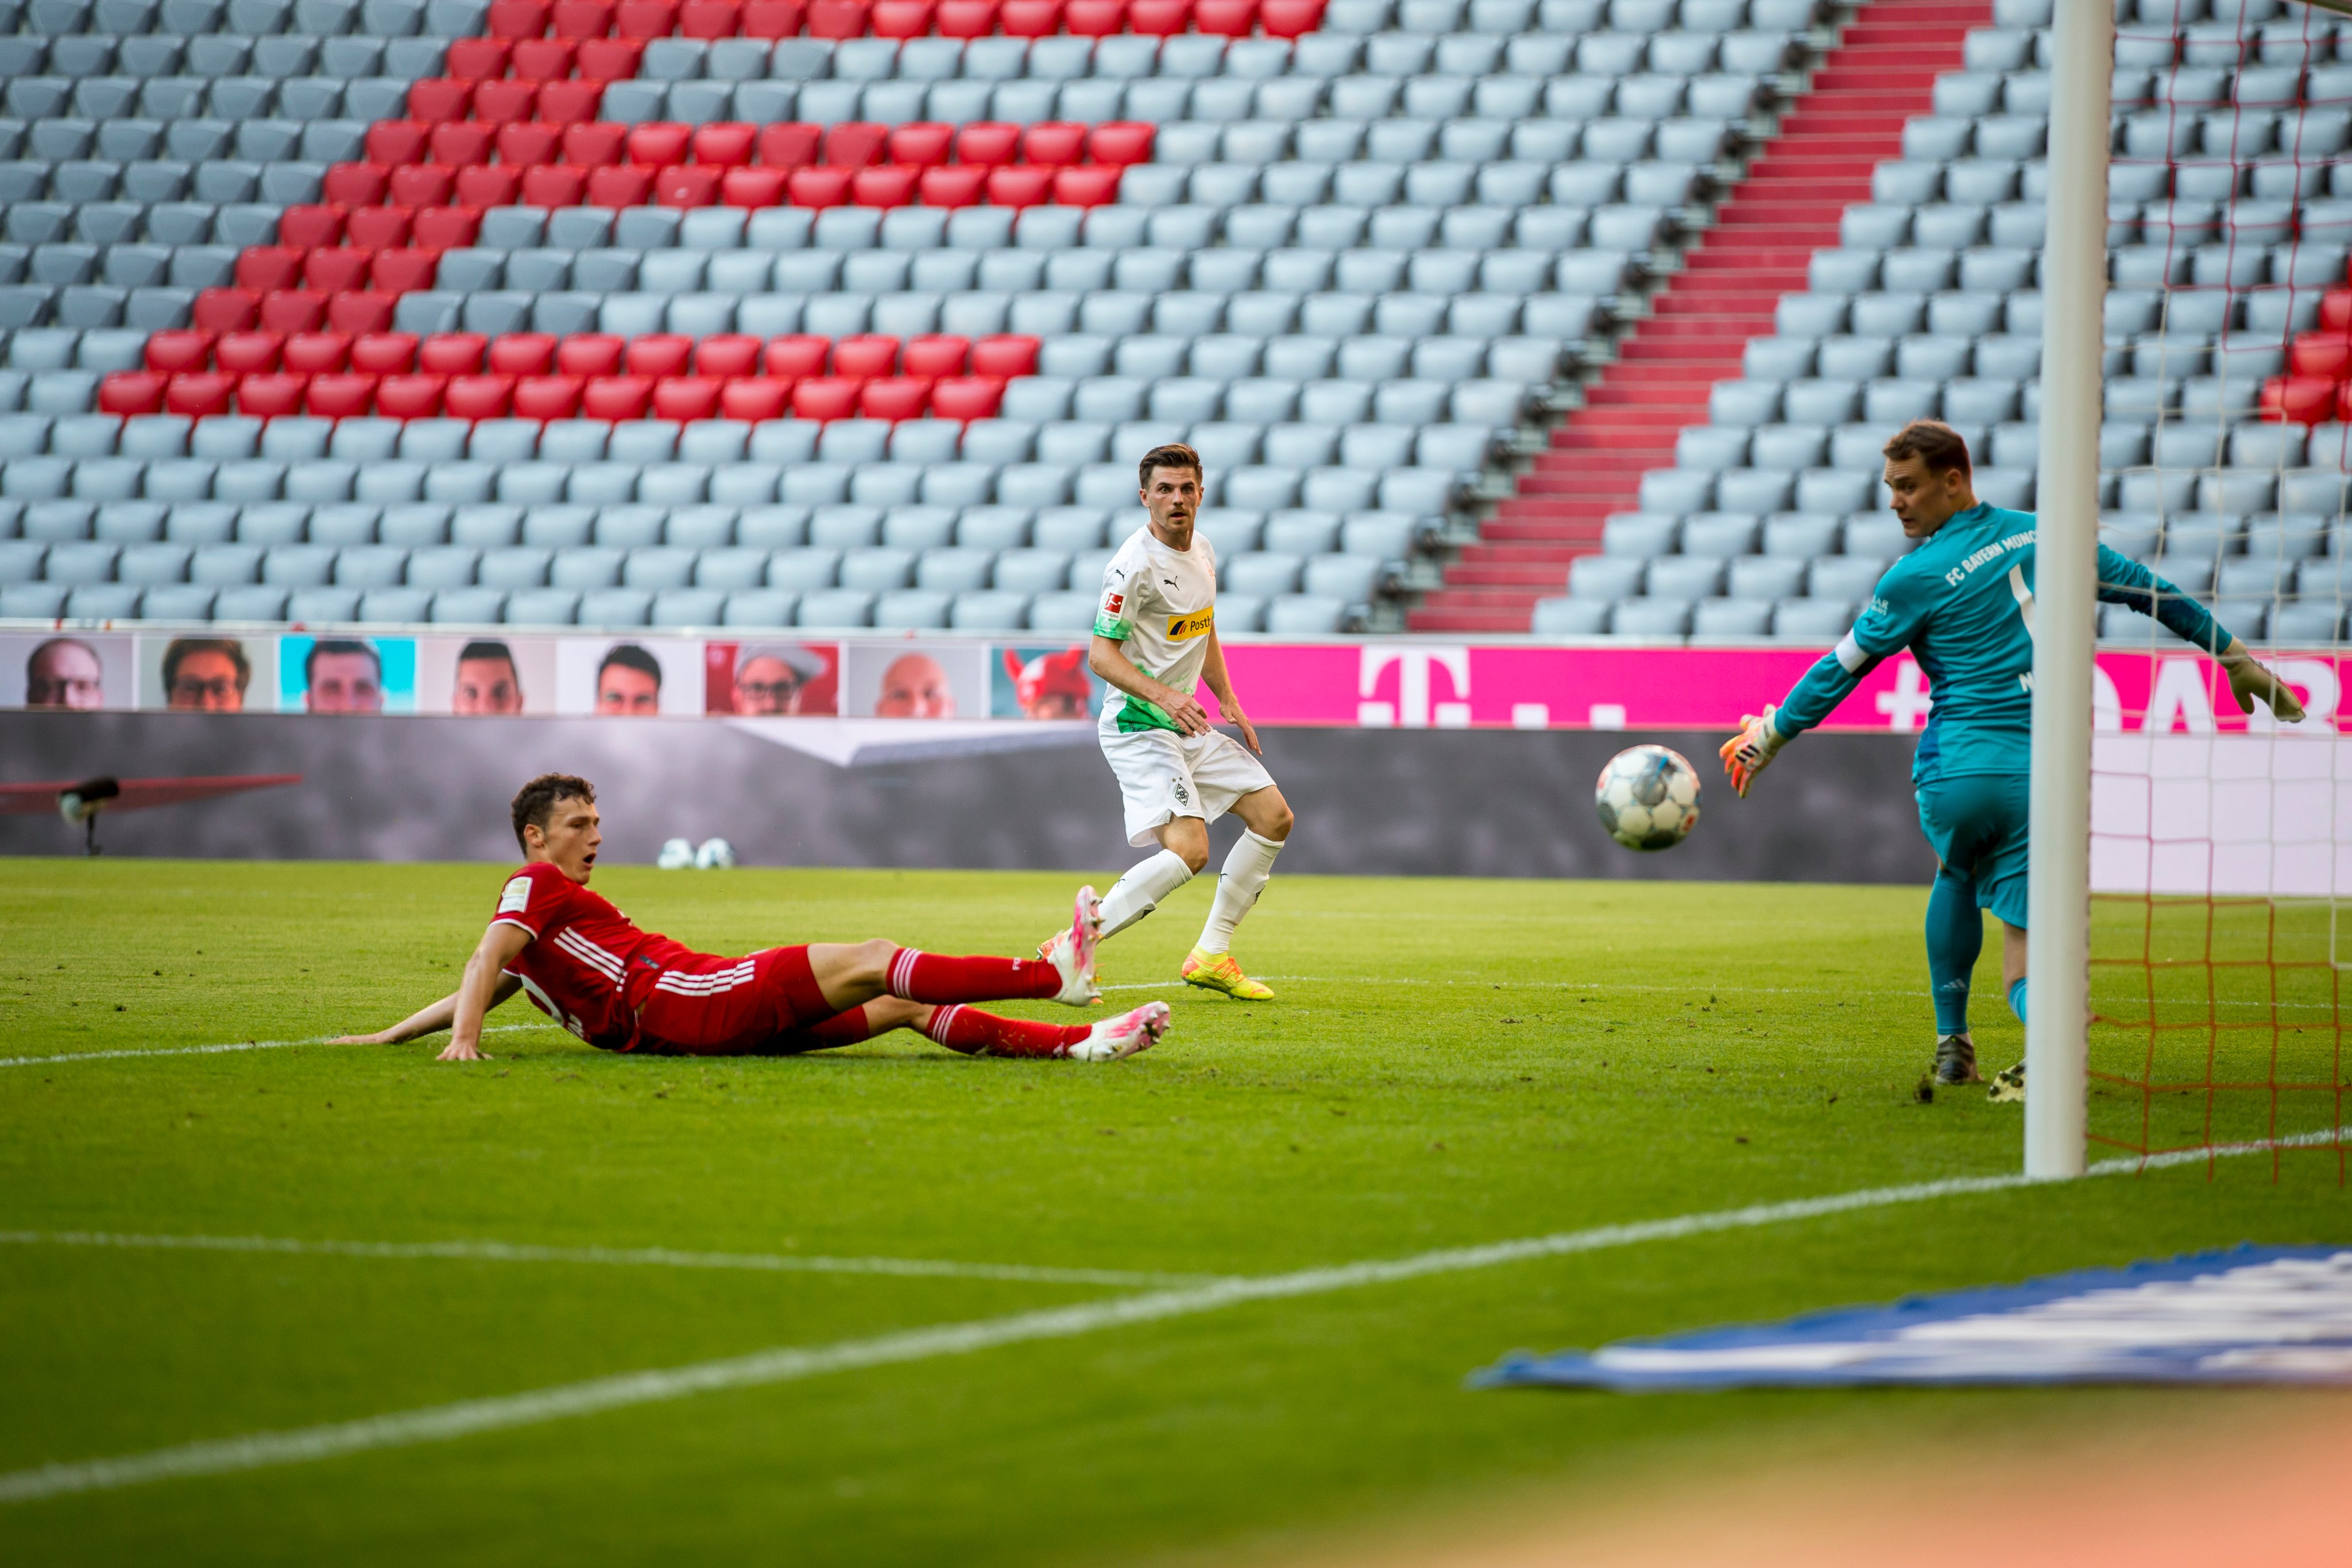 Бавария - Боруссия Менхенгладбах 2:1. Шаг к чемпионству - изображение 1